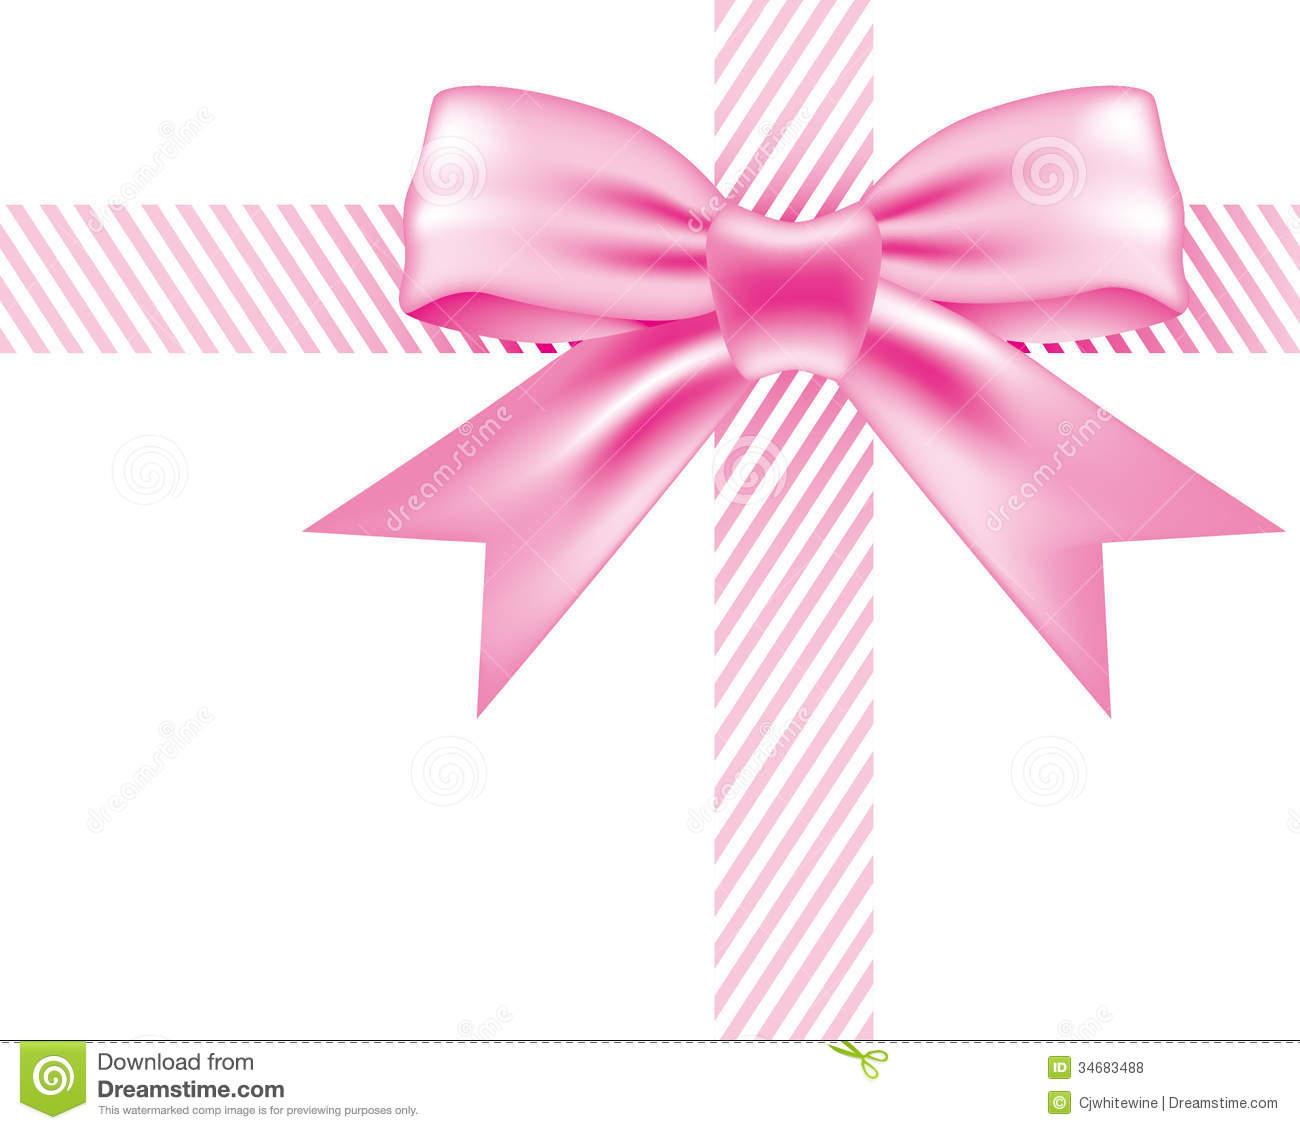 10 Pink Bow Vector Images - Pink Ribbon Bow Clip Art Free ...